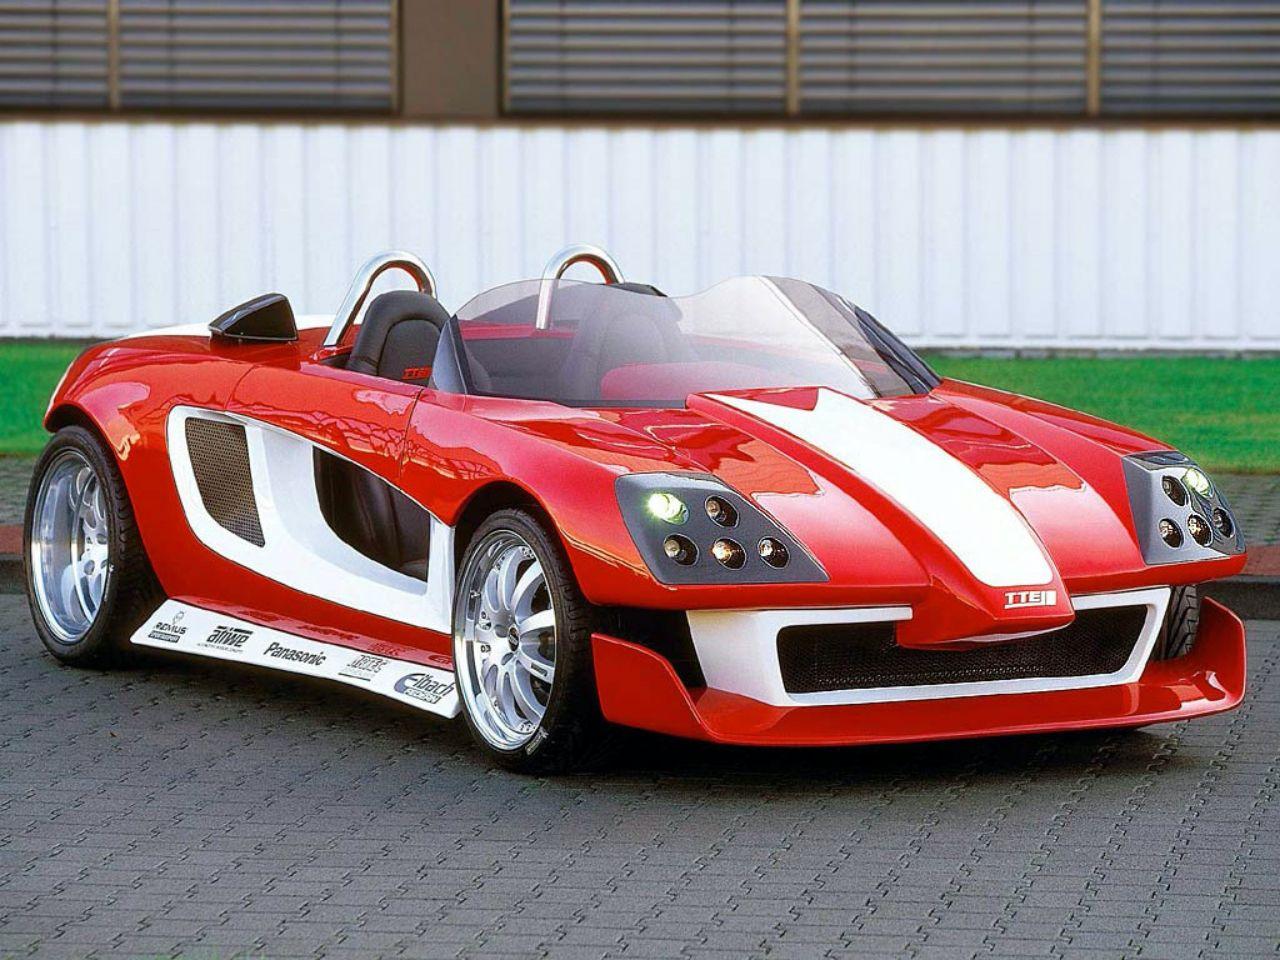 Toyota-MR2-Street-Affair-Concept-4